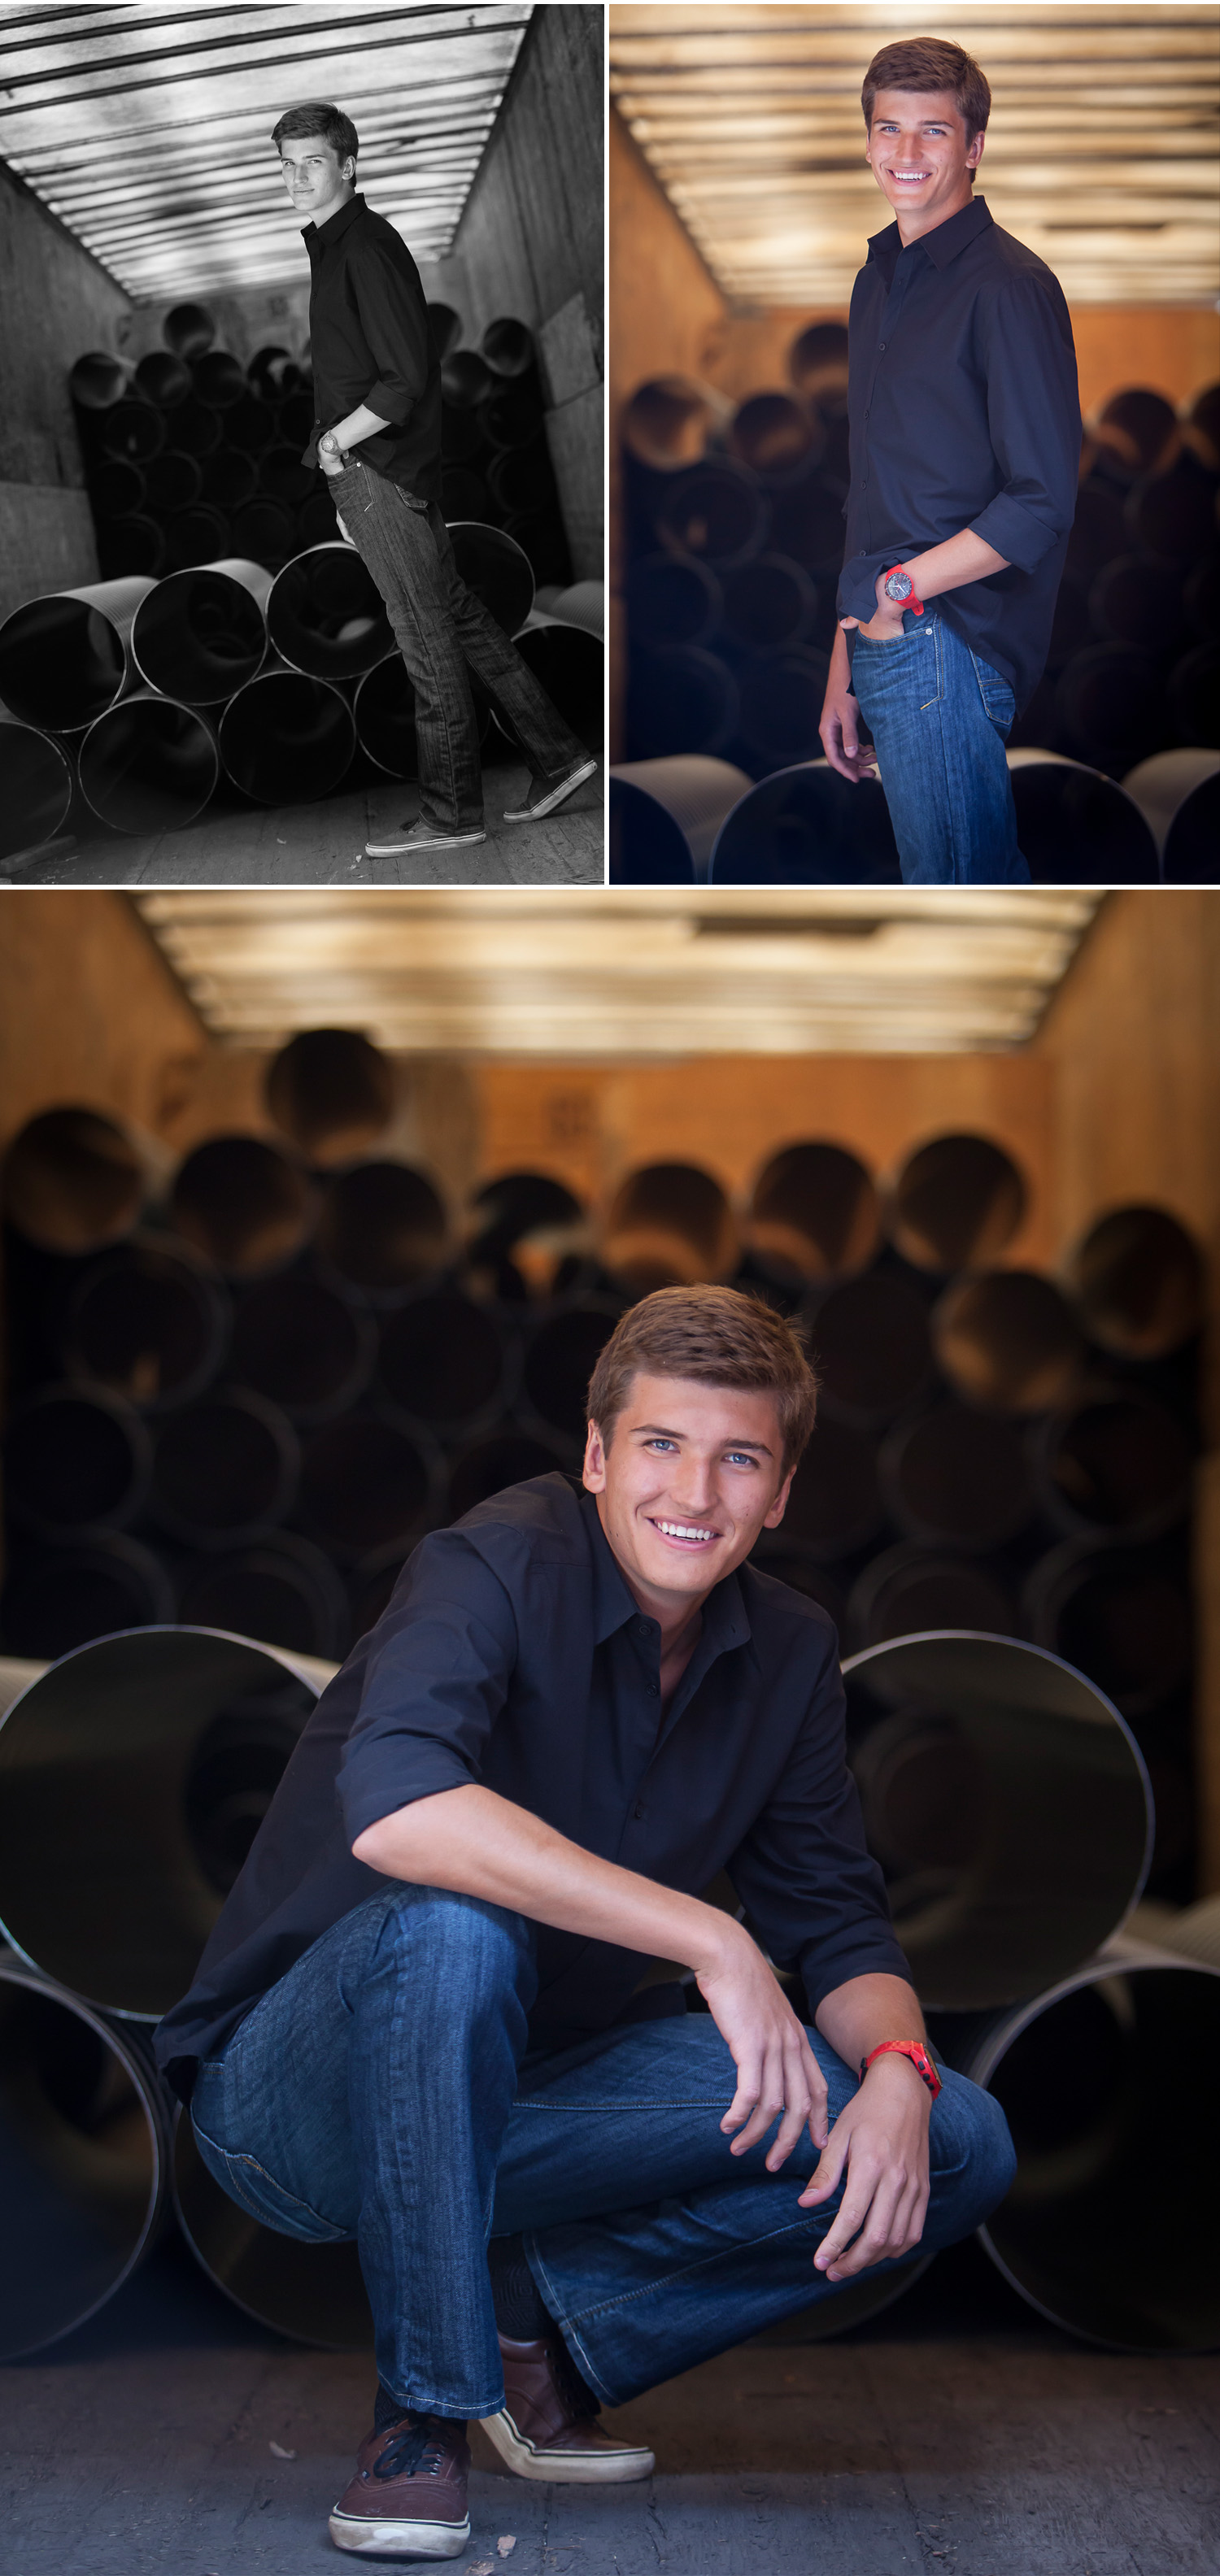 High school senior boy photos in Denver with photographer Jennifer Koskinen   Merritt Portrait Studio